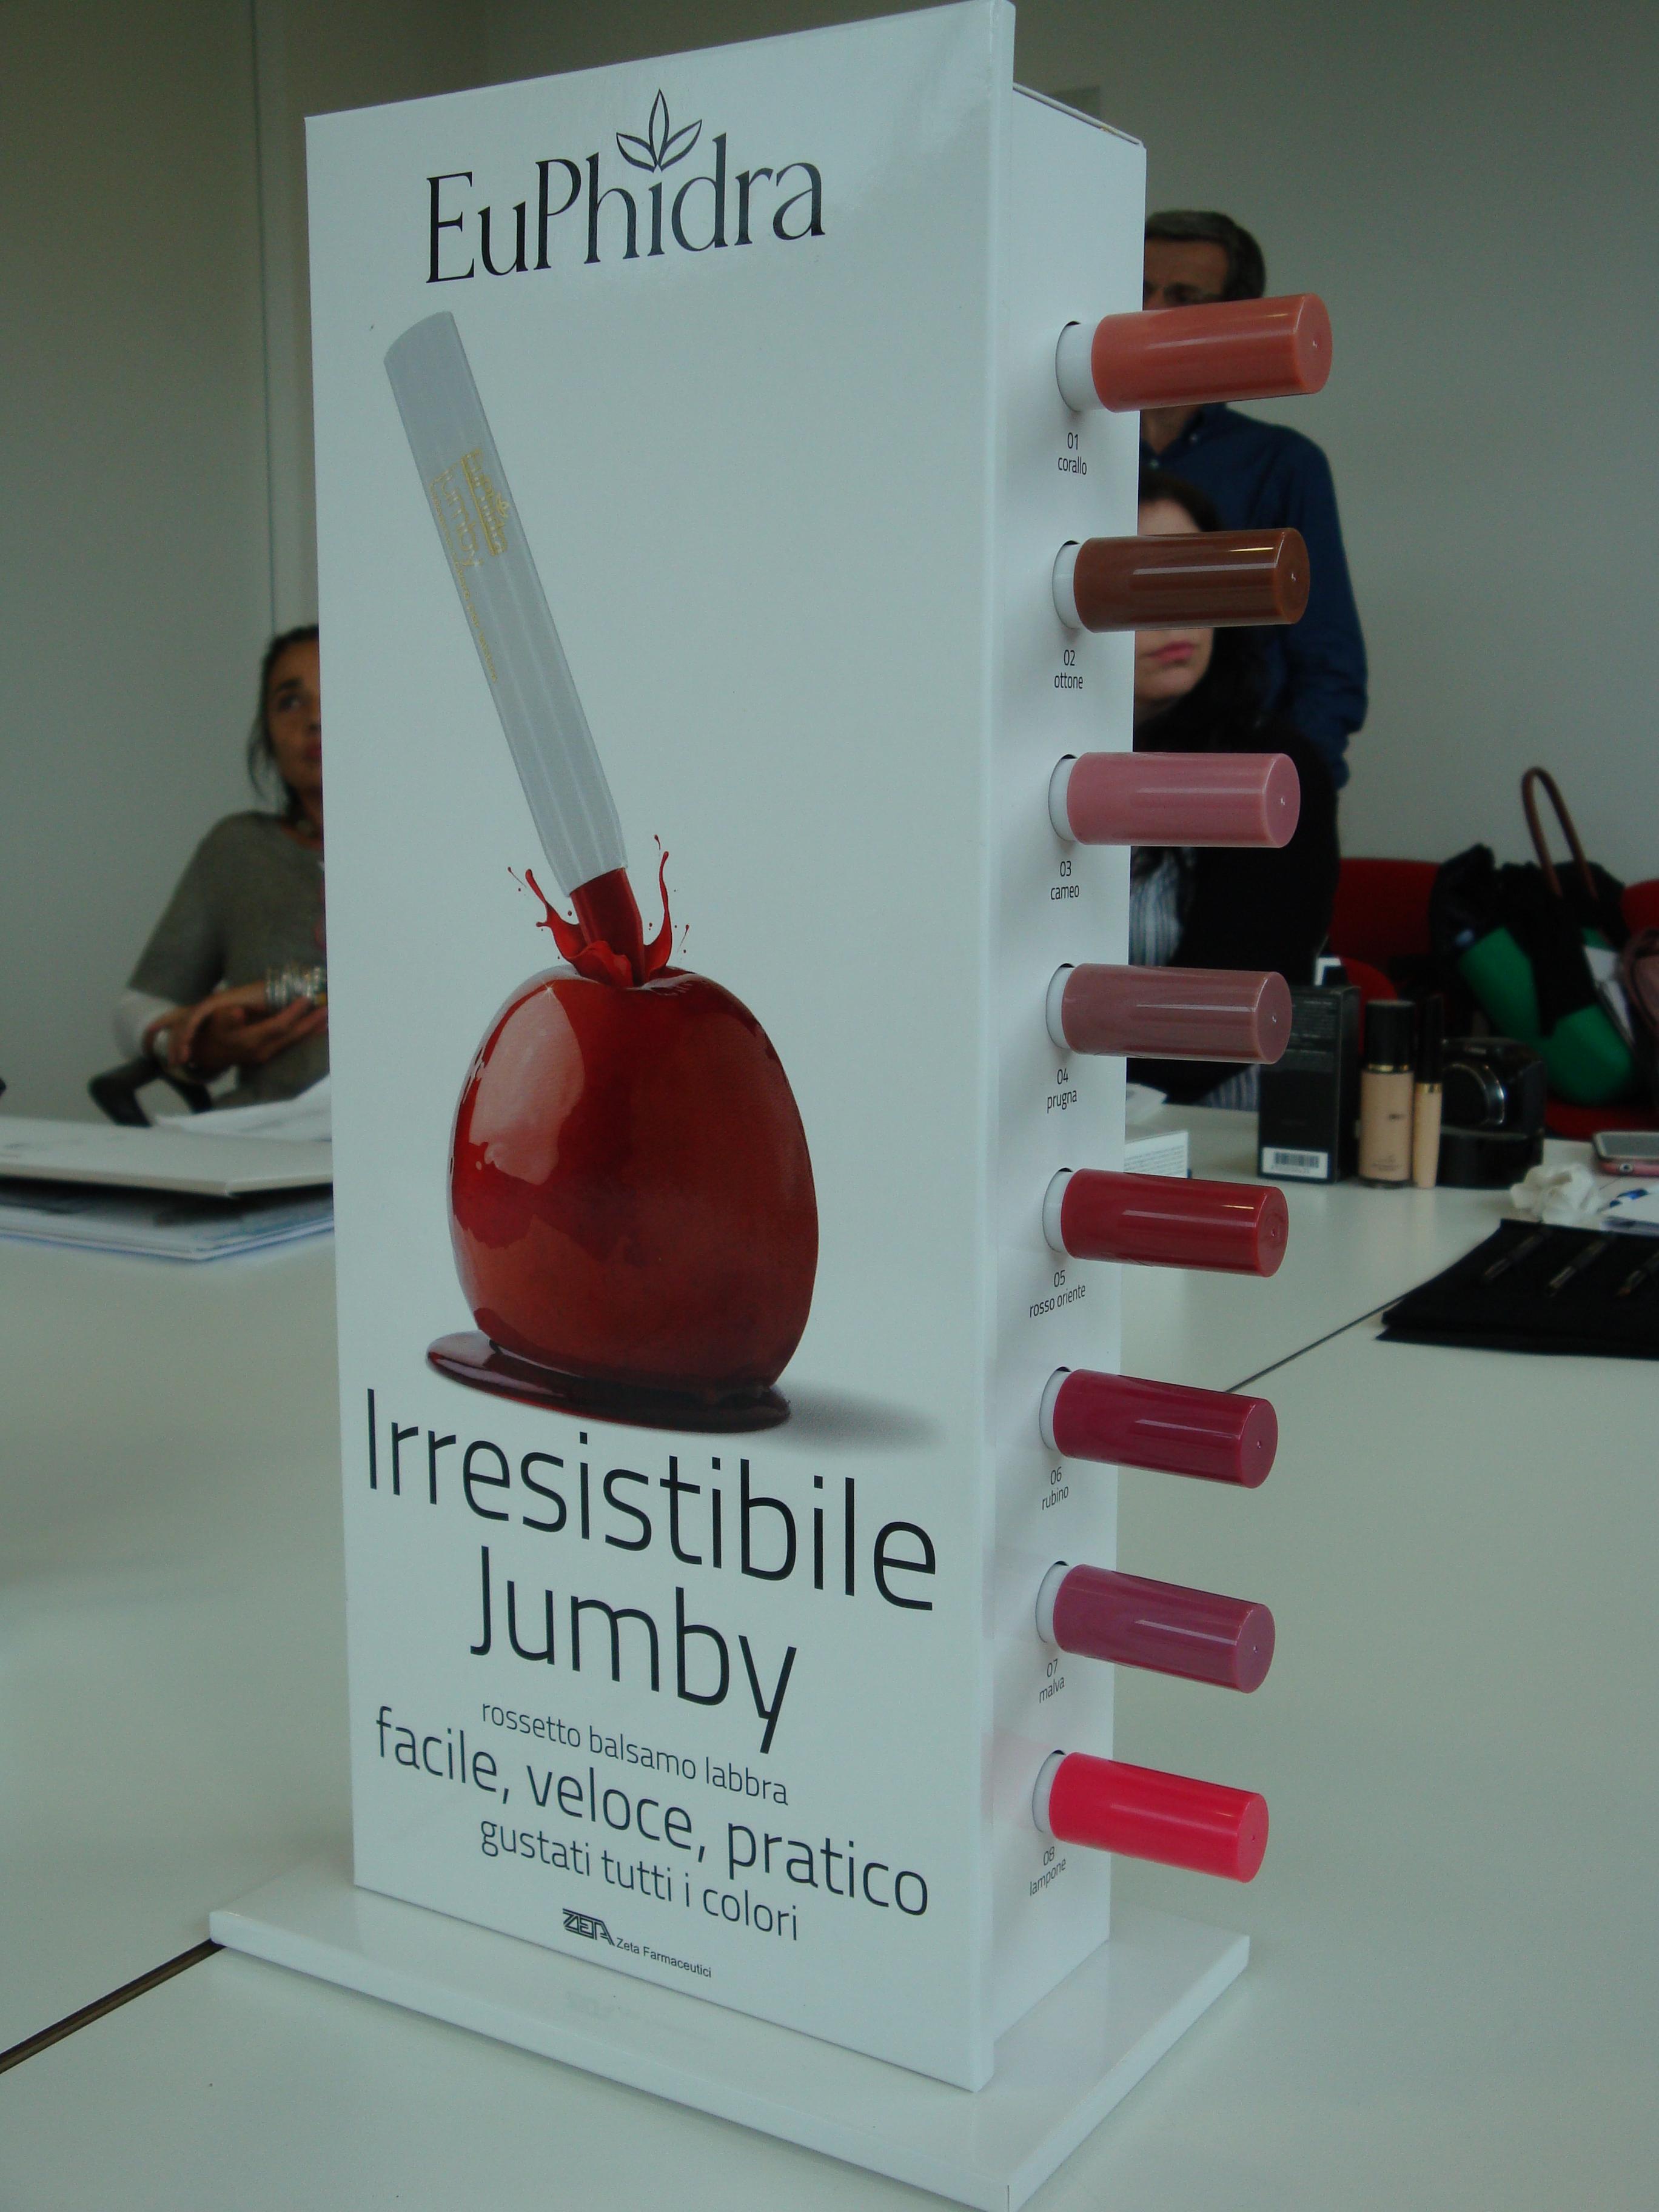 EuPhidra Jumby - matitoni idratanti labbra